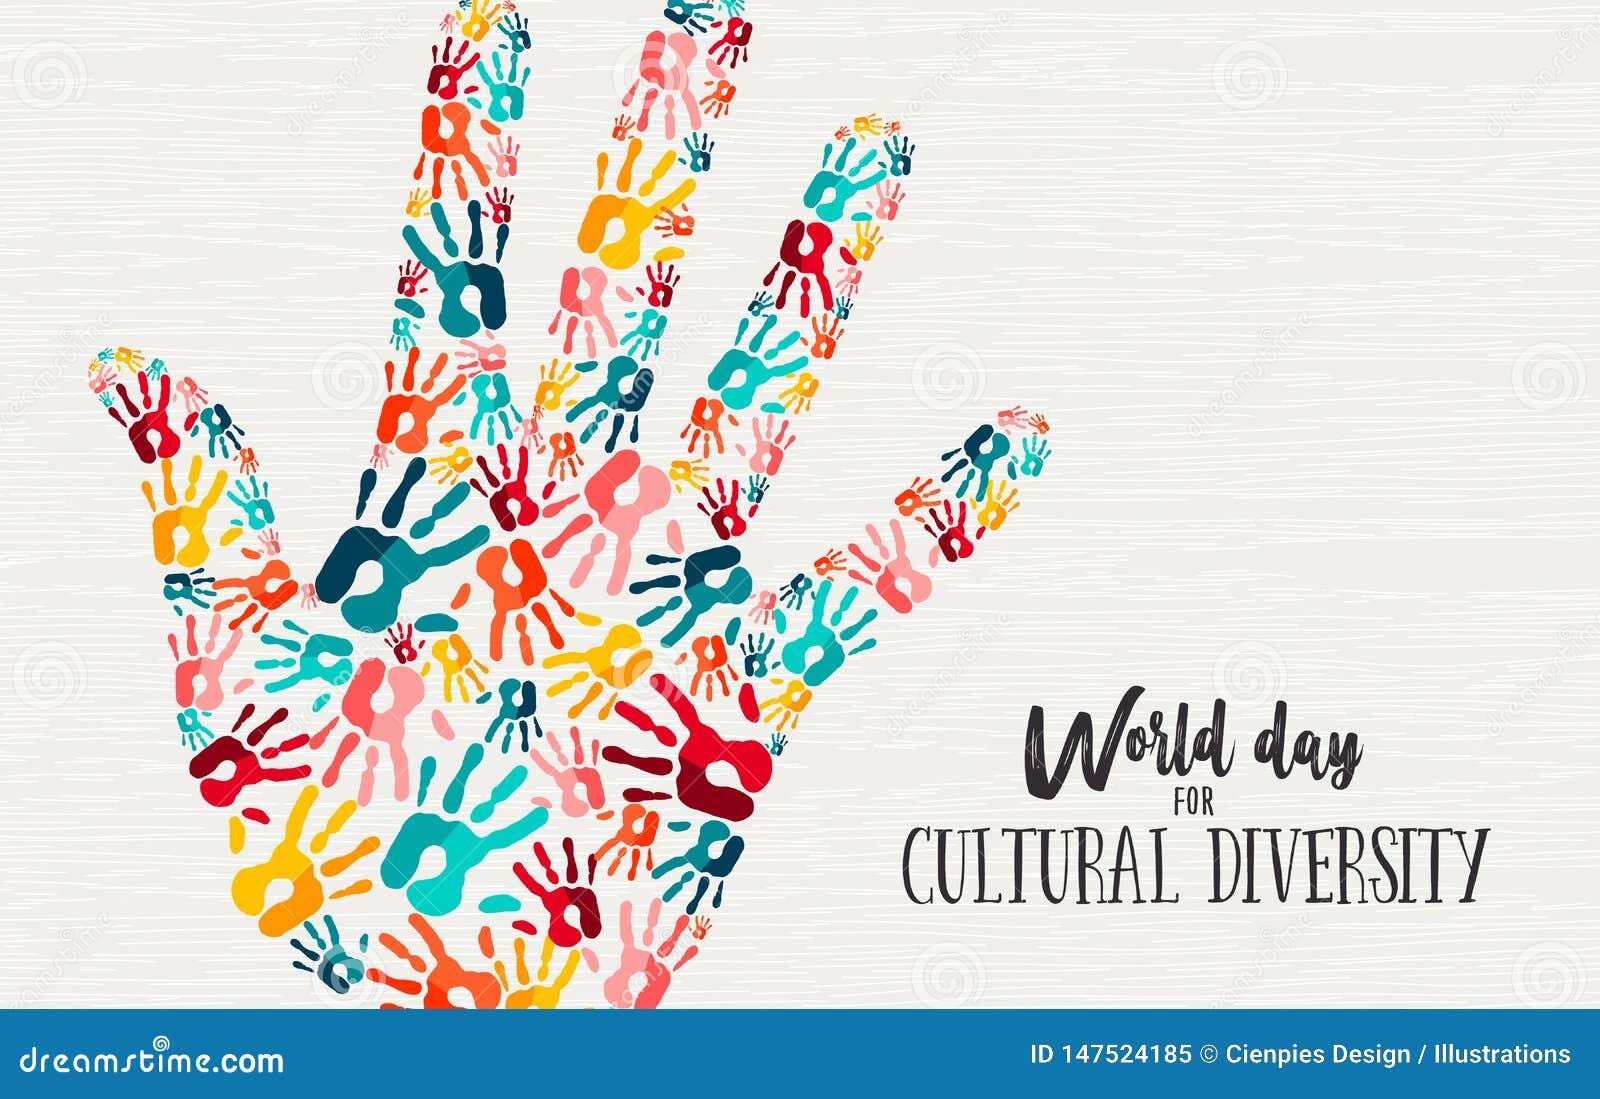 Różnorodność Kulturalna dnia ręki pojęcia różnorodna karta